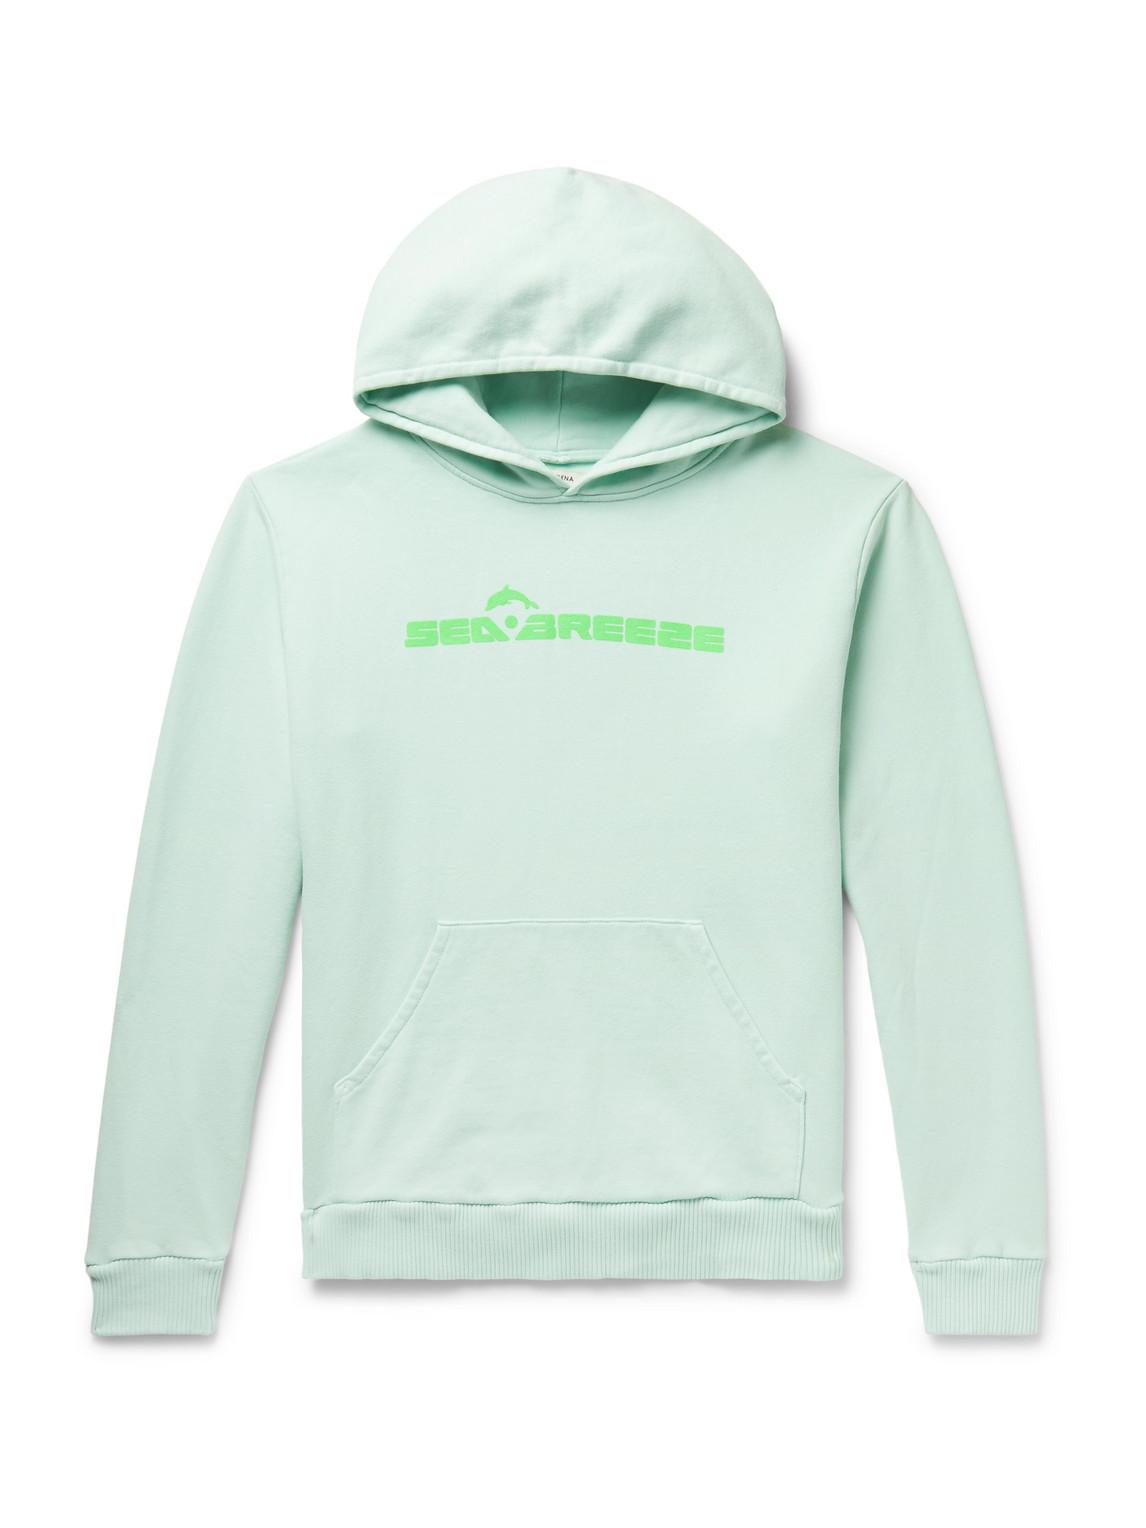 pasadena leisure club - sea breeze printed fleece-back cotton-jersey hoodie - men - green - s